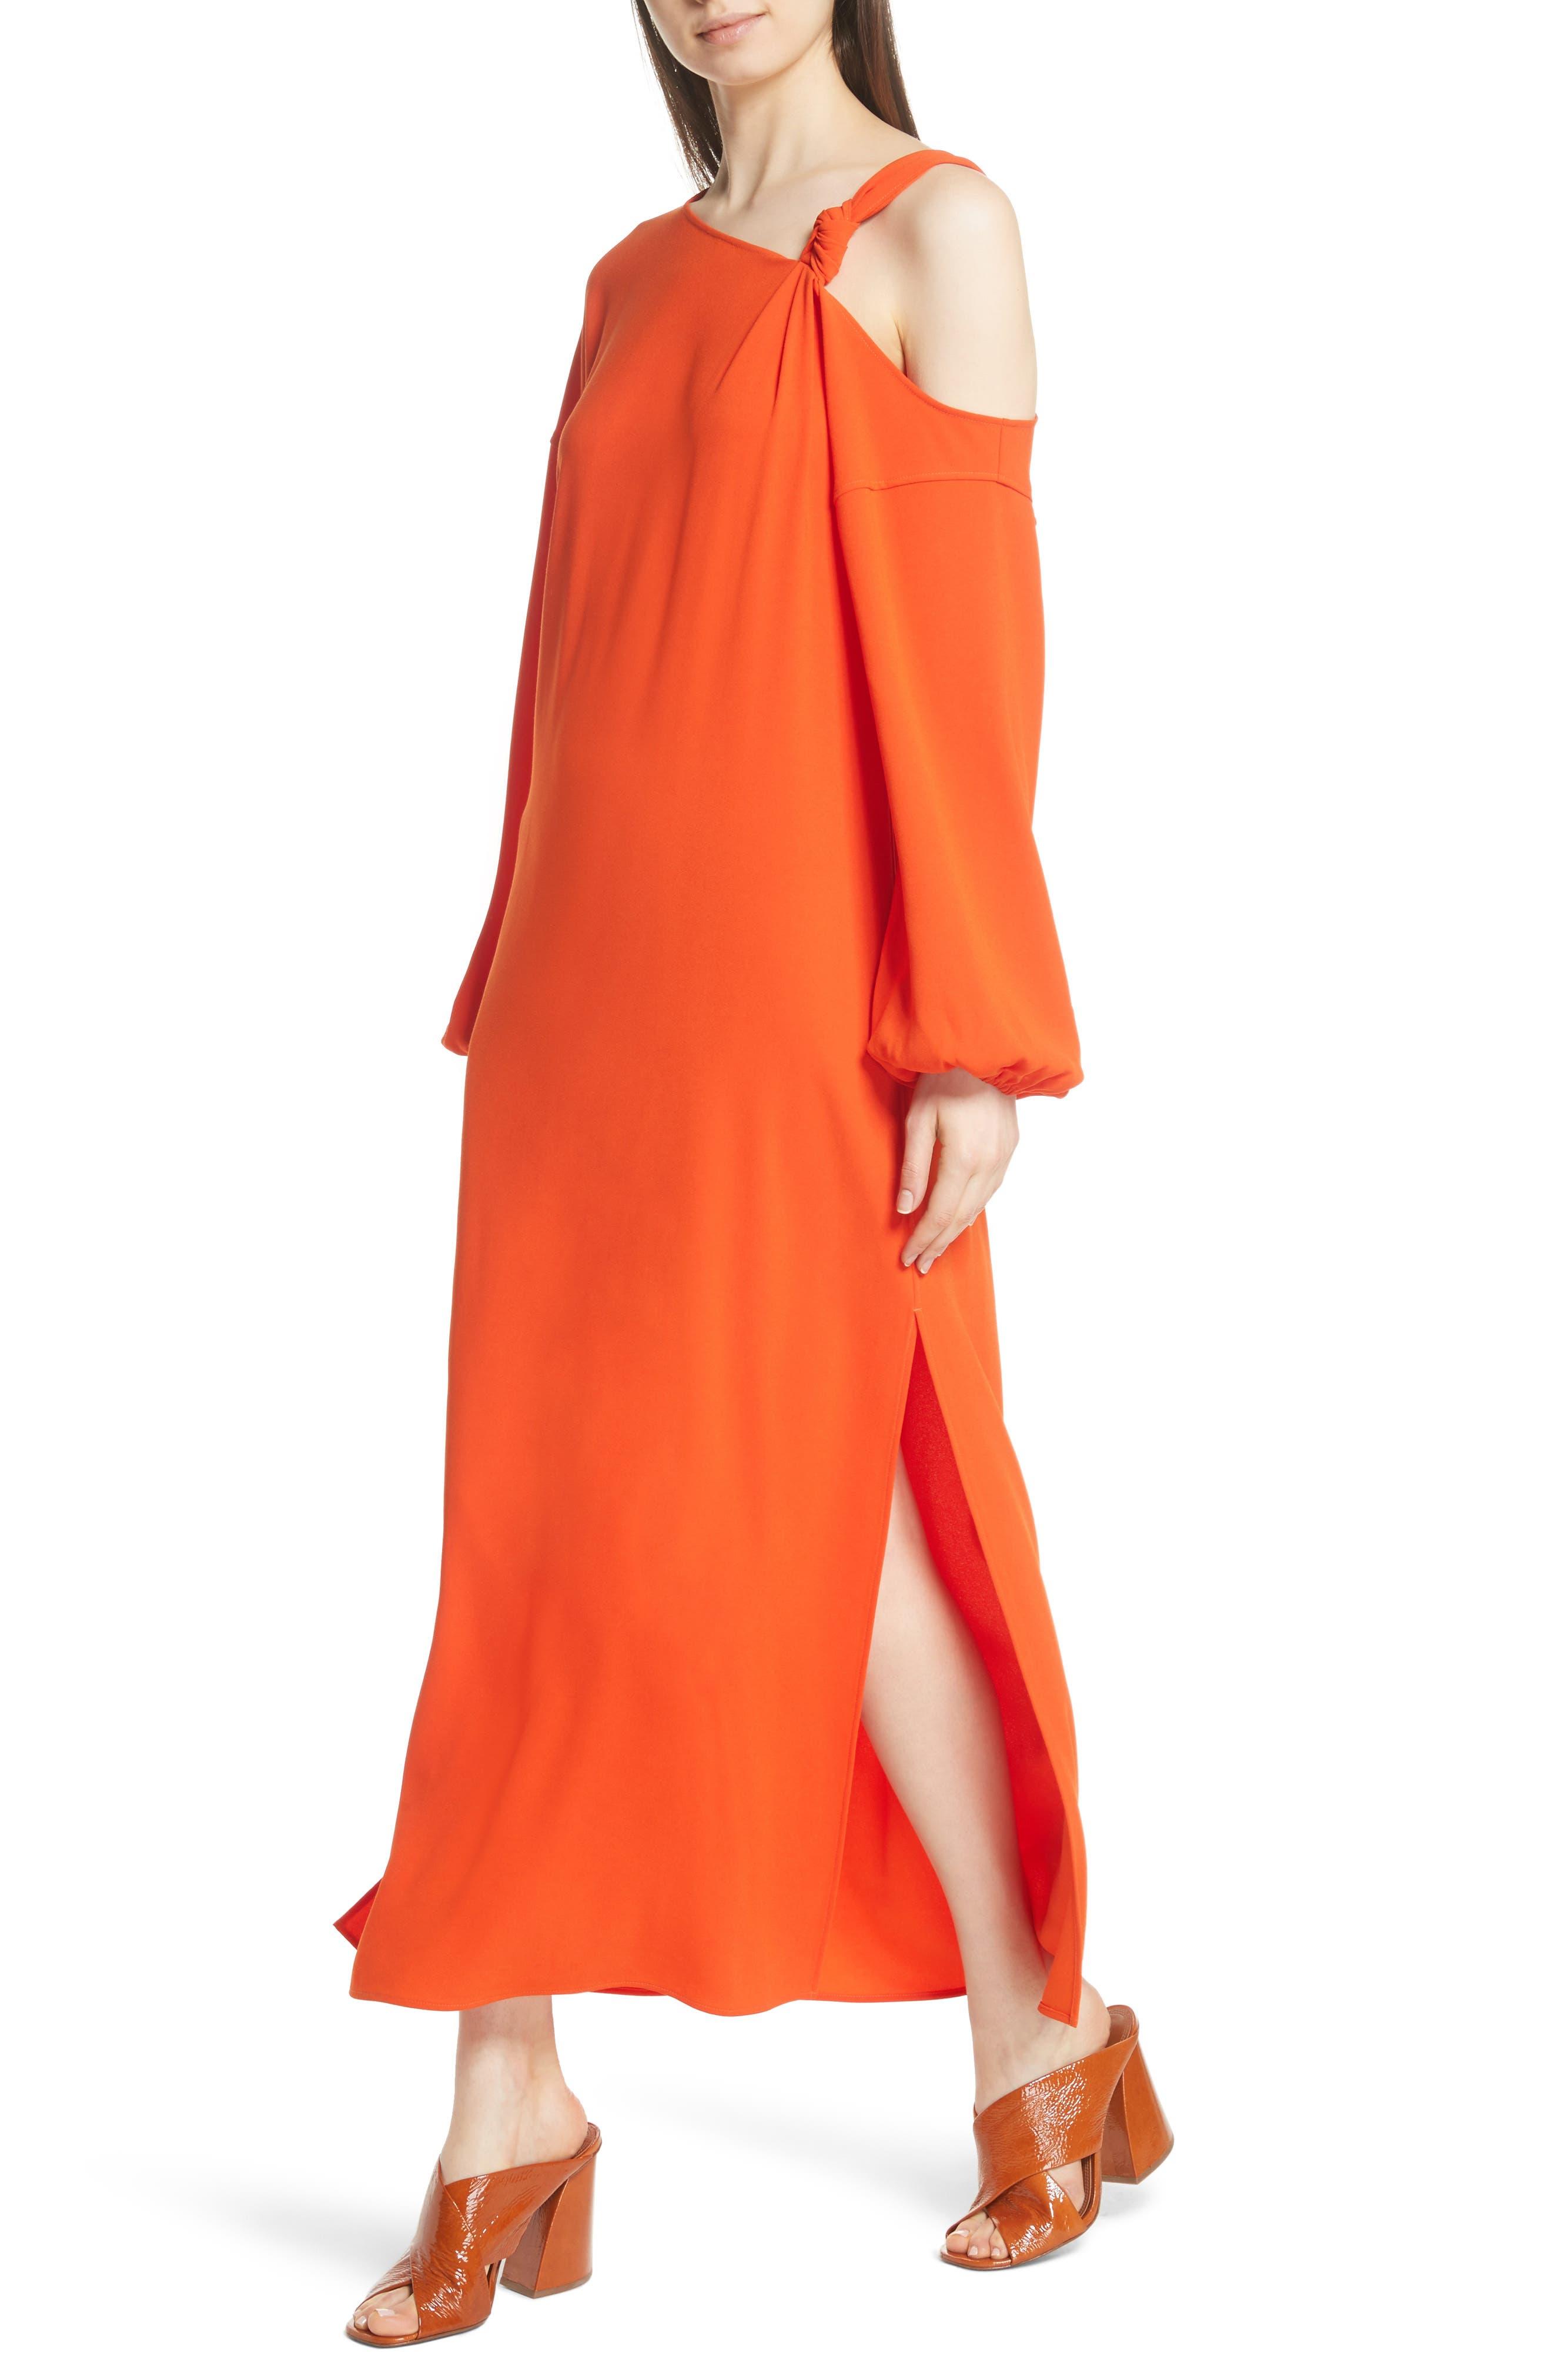 ELIZABETH AND JAMES,                             Shontae One-Shoulder Maxi Dress,                             Alternate thumbnail 4, color,                             807